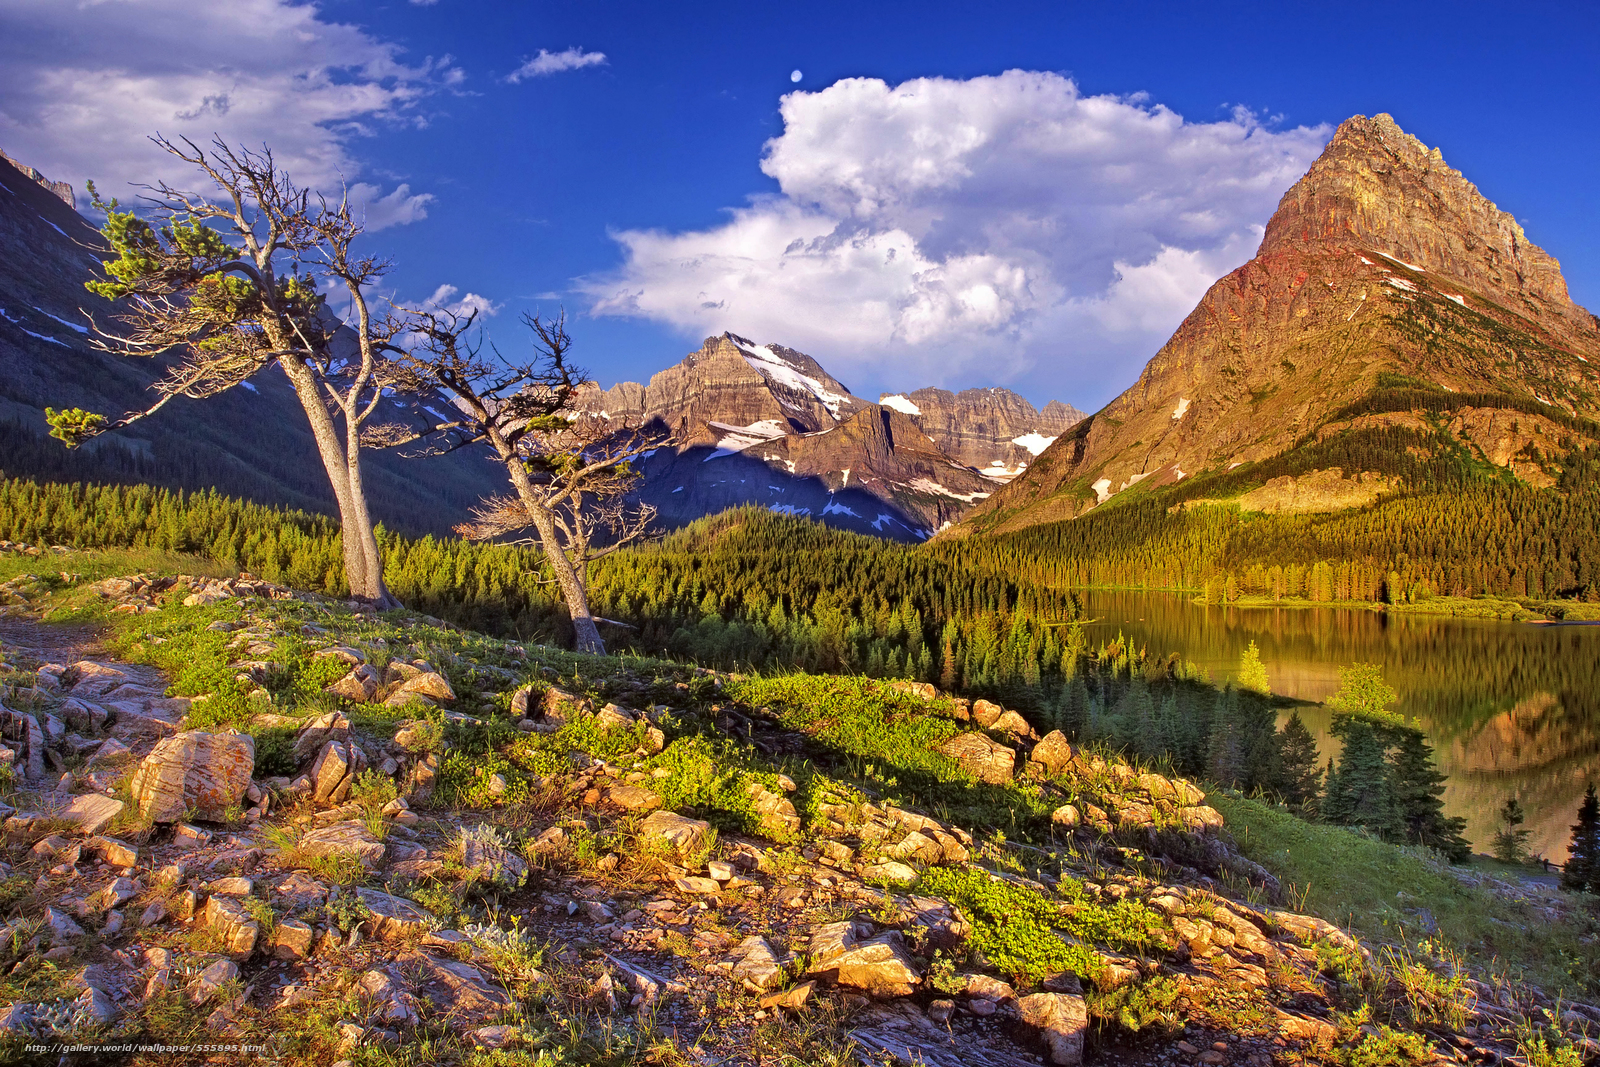 Download wallpaper Glacier National Park Mountains lake landscape 1600x1067